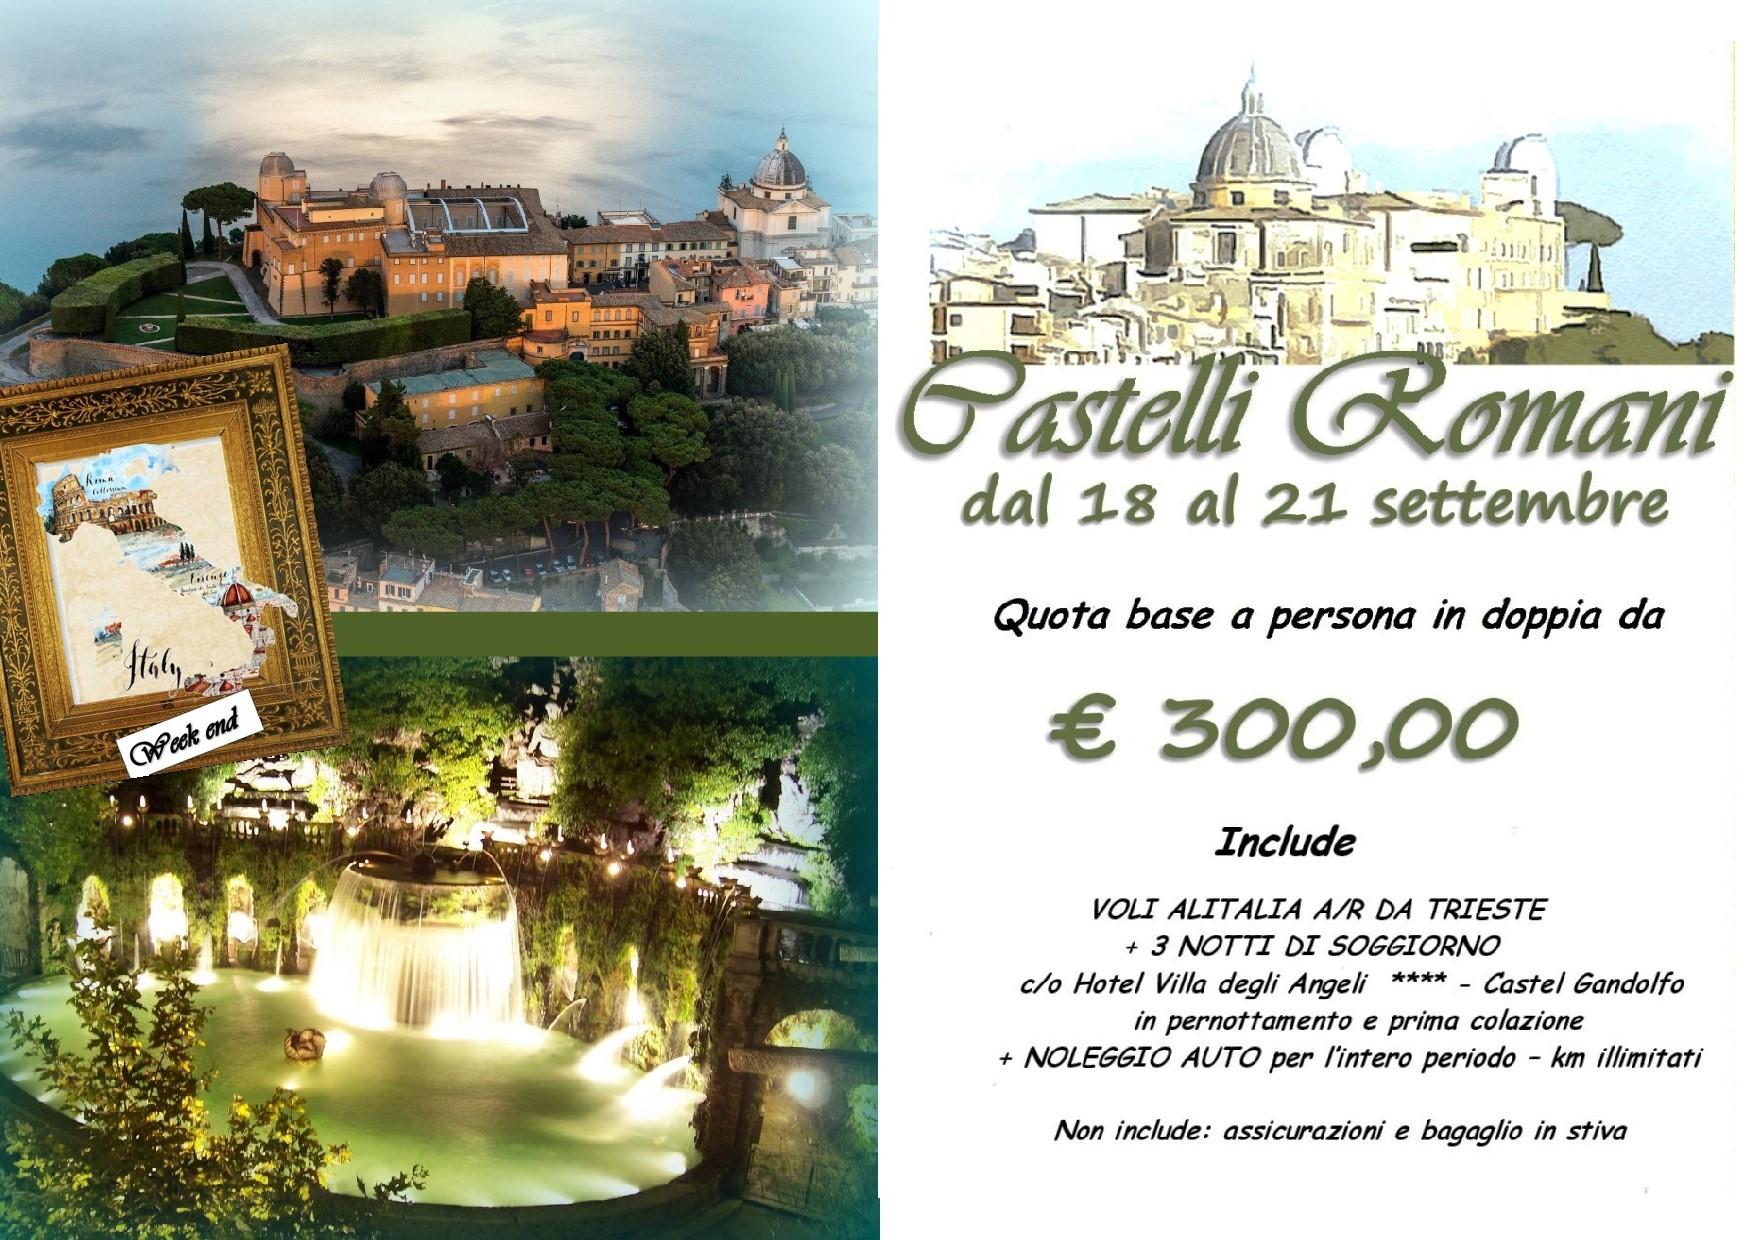 castelli-romani-poster-2